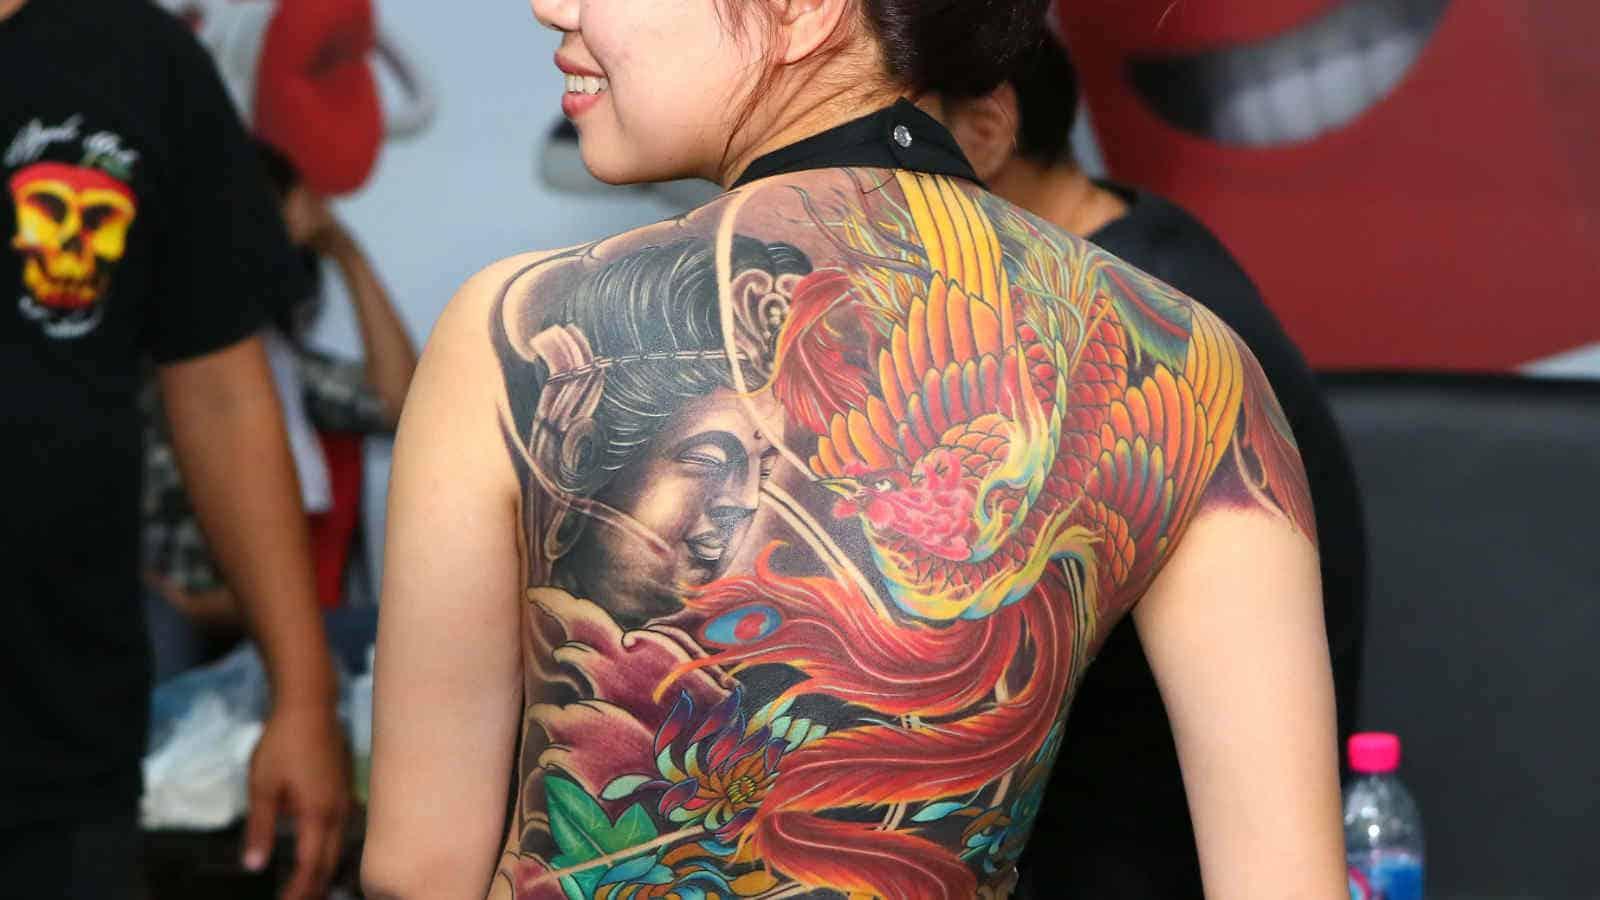 Phönix-Tattoo- Die Bedeutung dahinter & tolle Tattoo-Motive